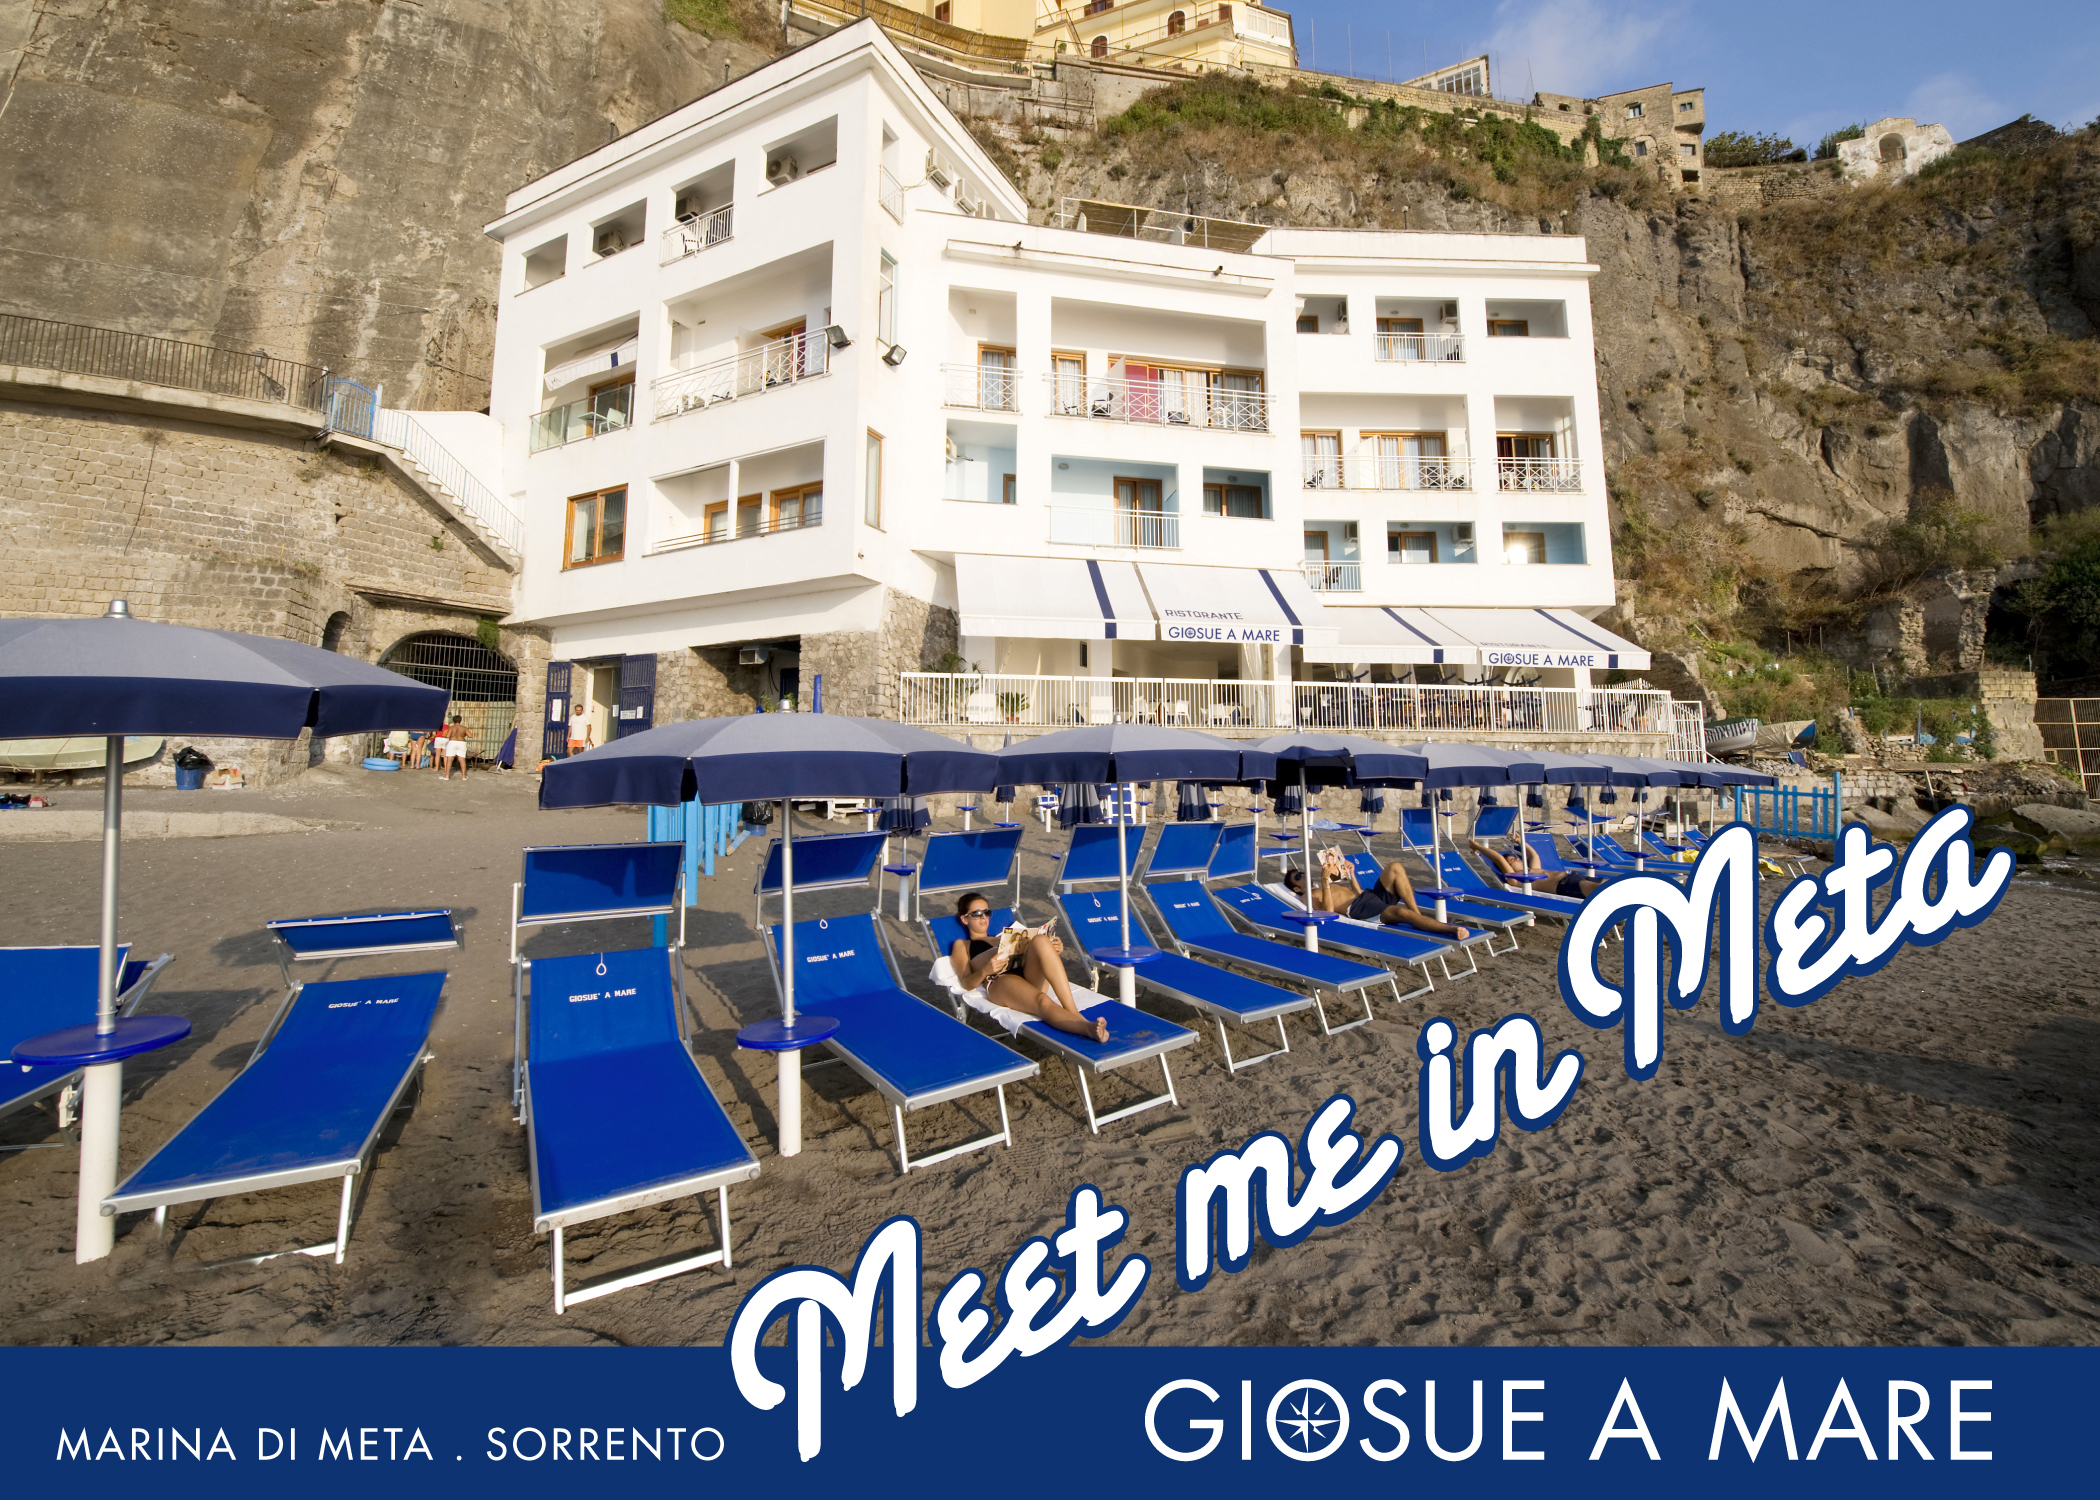 GiosueAMare_postcard_001.jpg